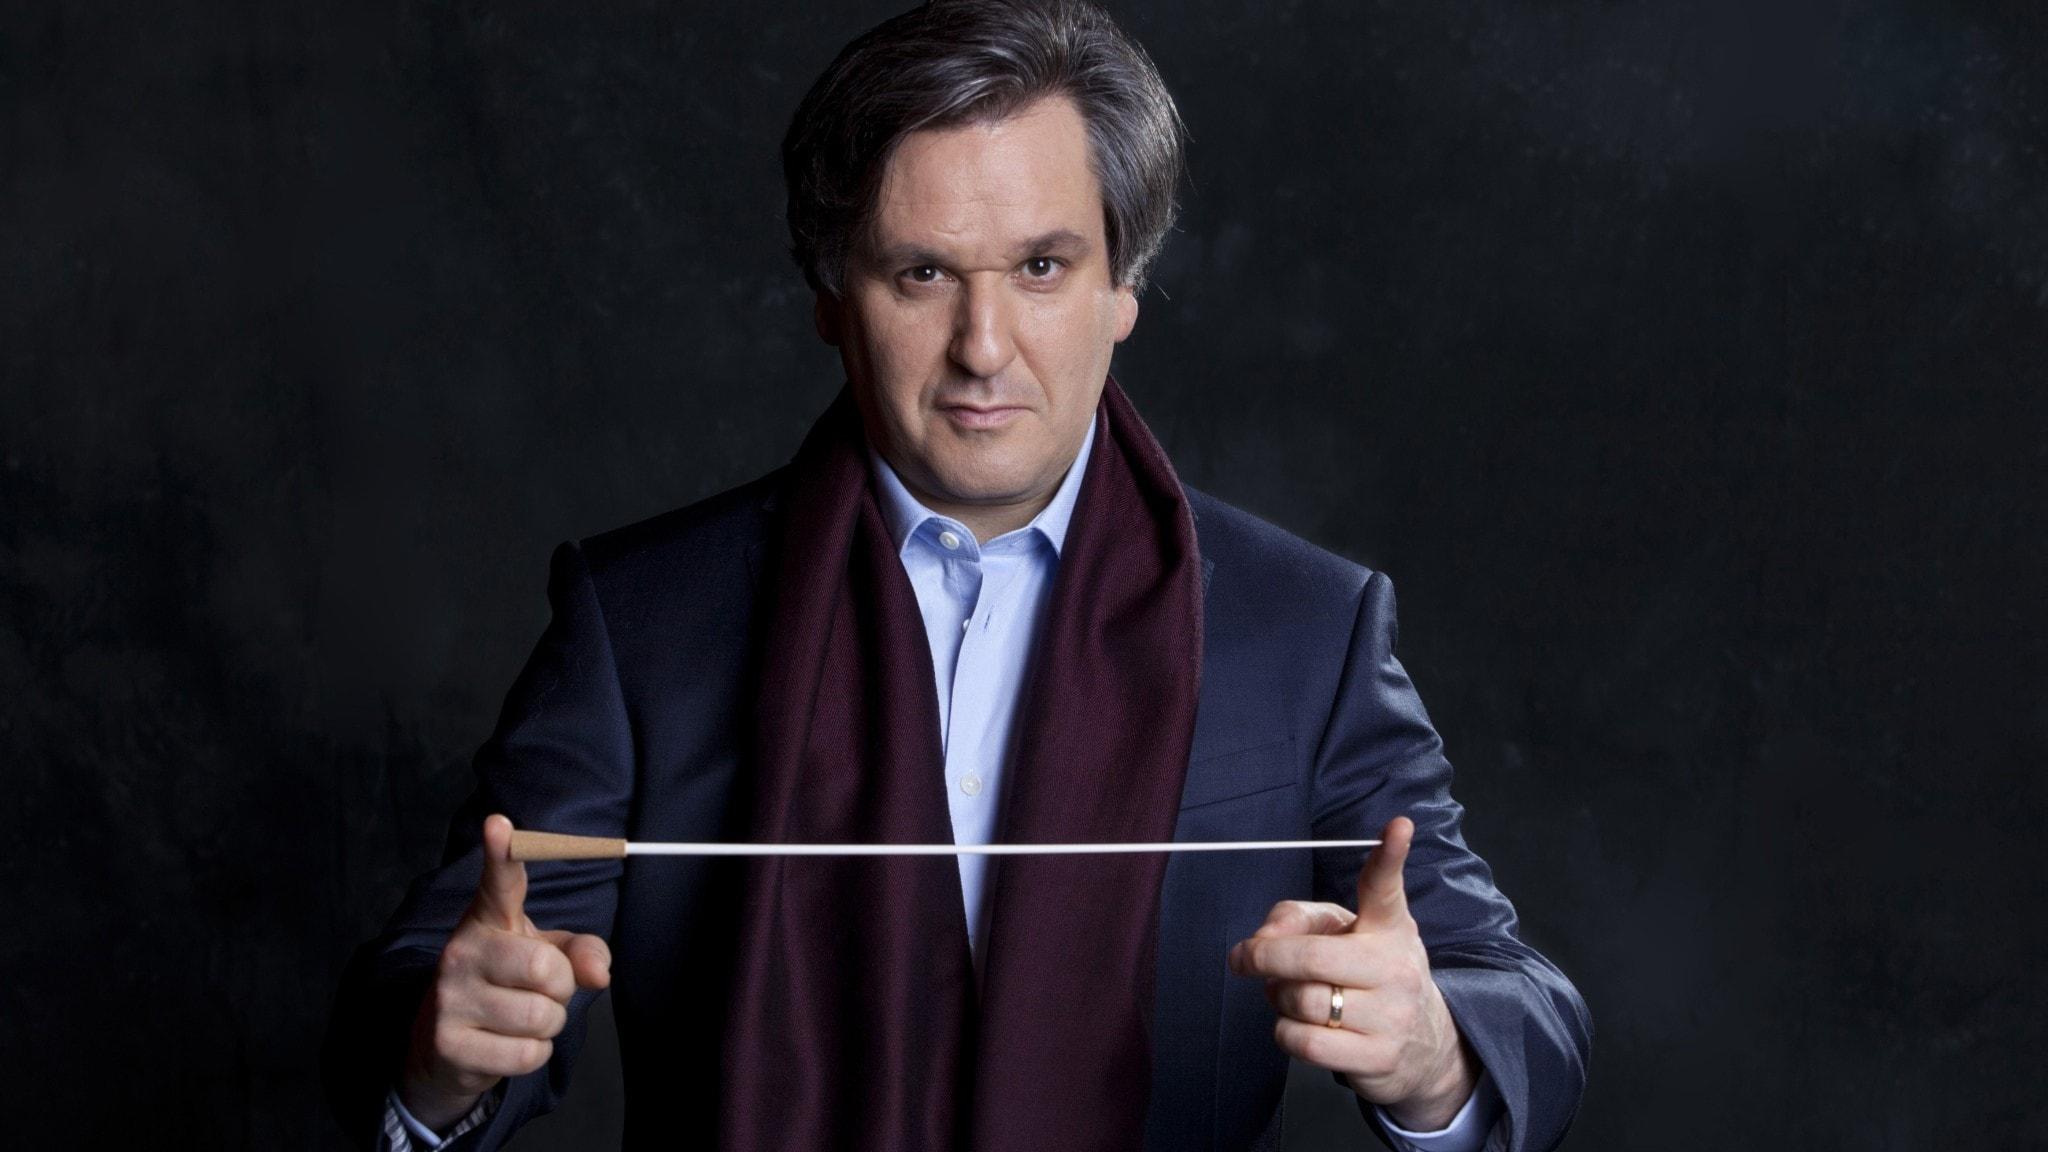 Antonio Pappano dirigerar Covent Garden-operans kör och orkester. Foto: Pressbild/Musacchio & Ianniello.